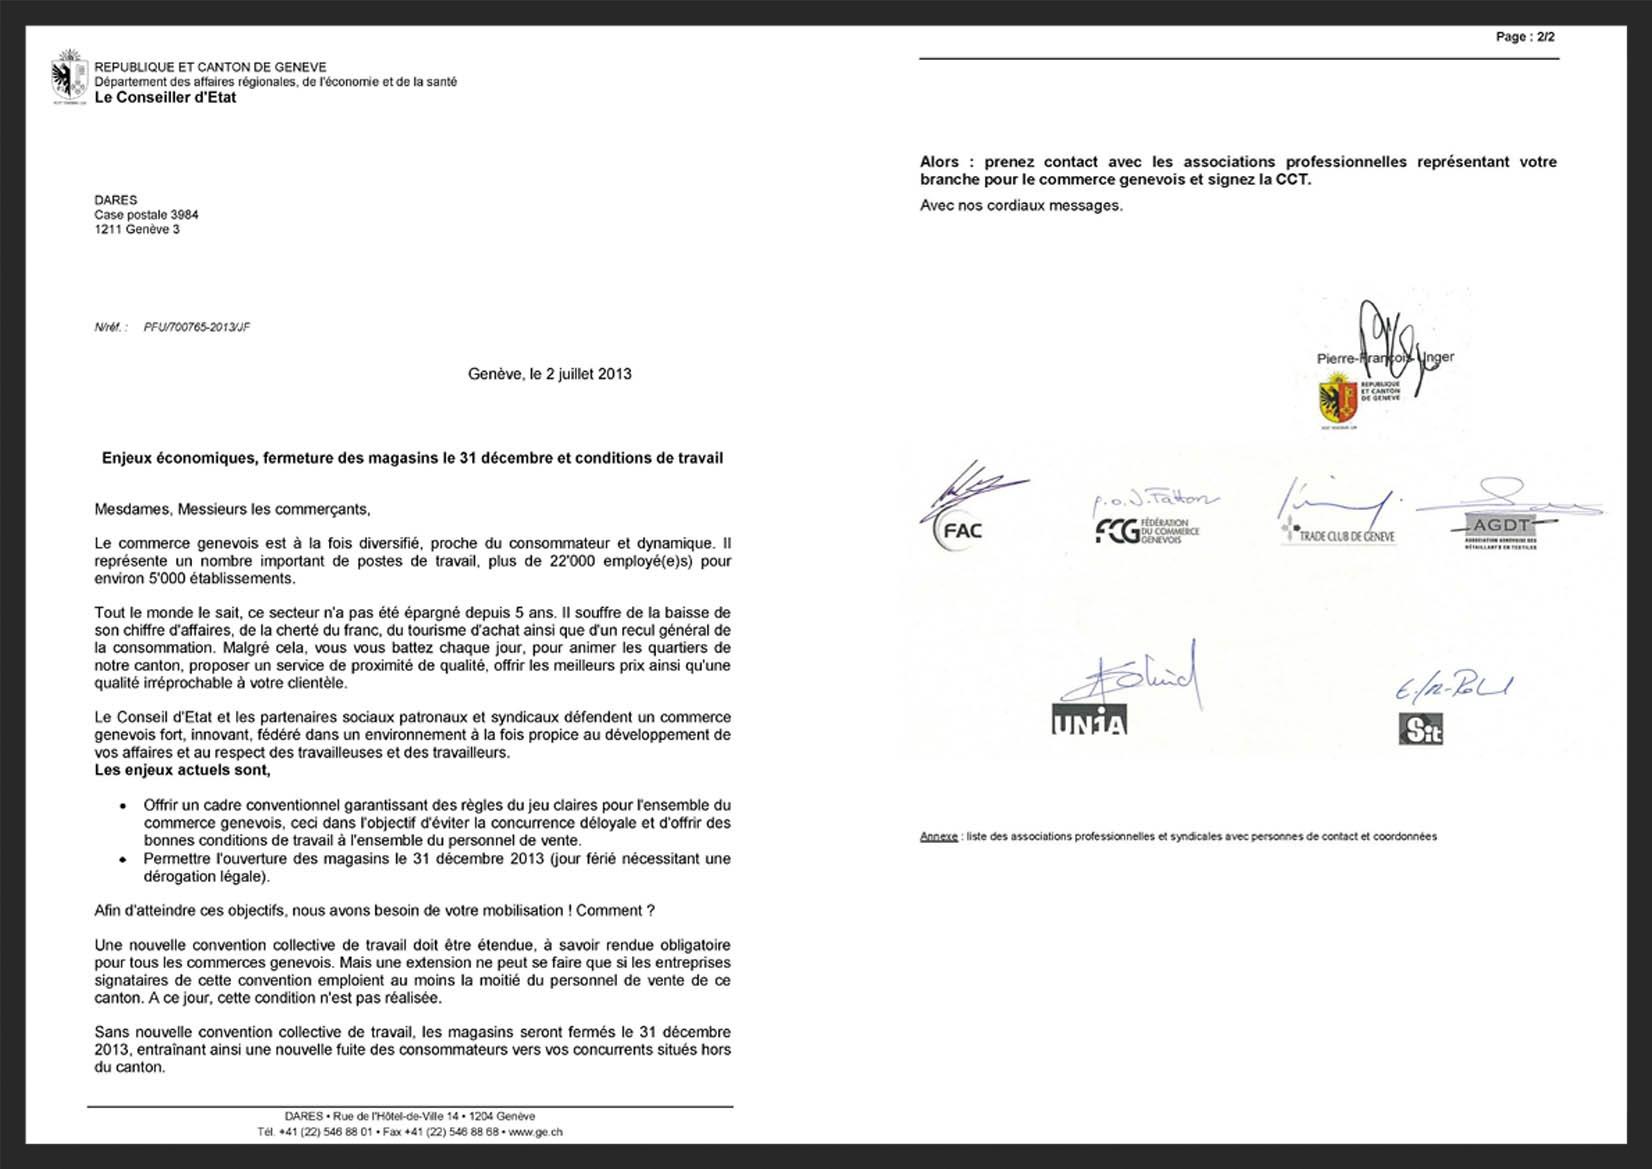 2013.03.07  Aux entreprises du commerce genevois.jpg